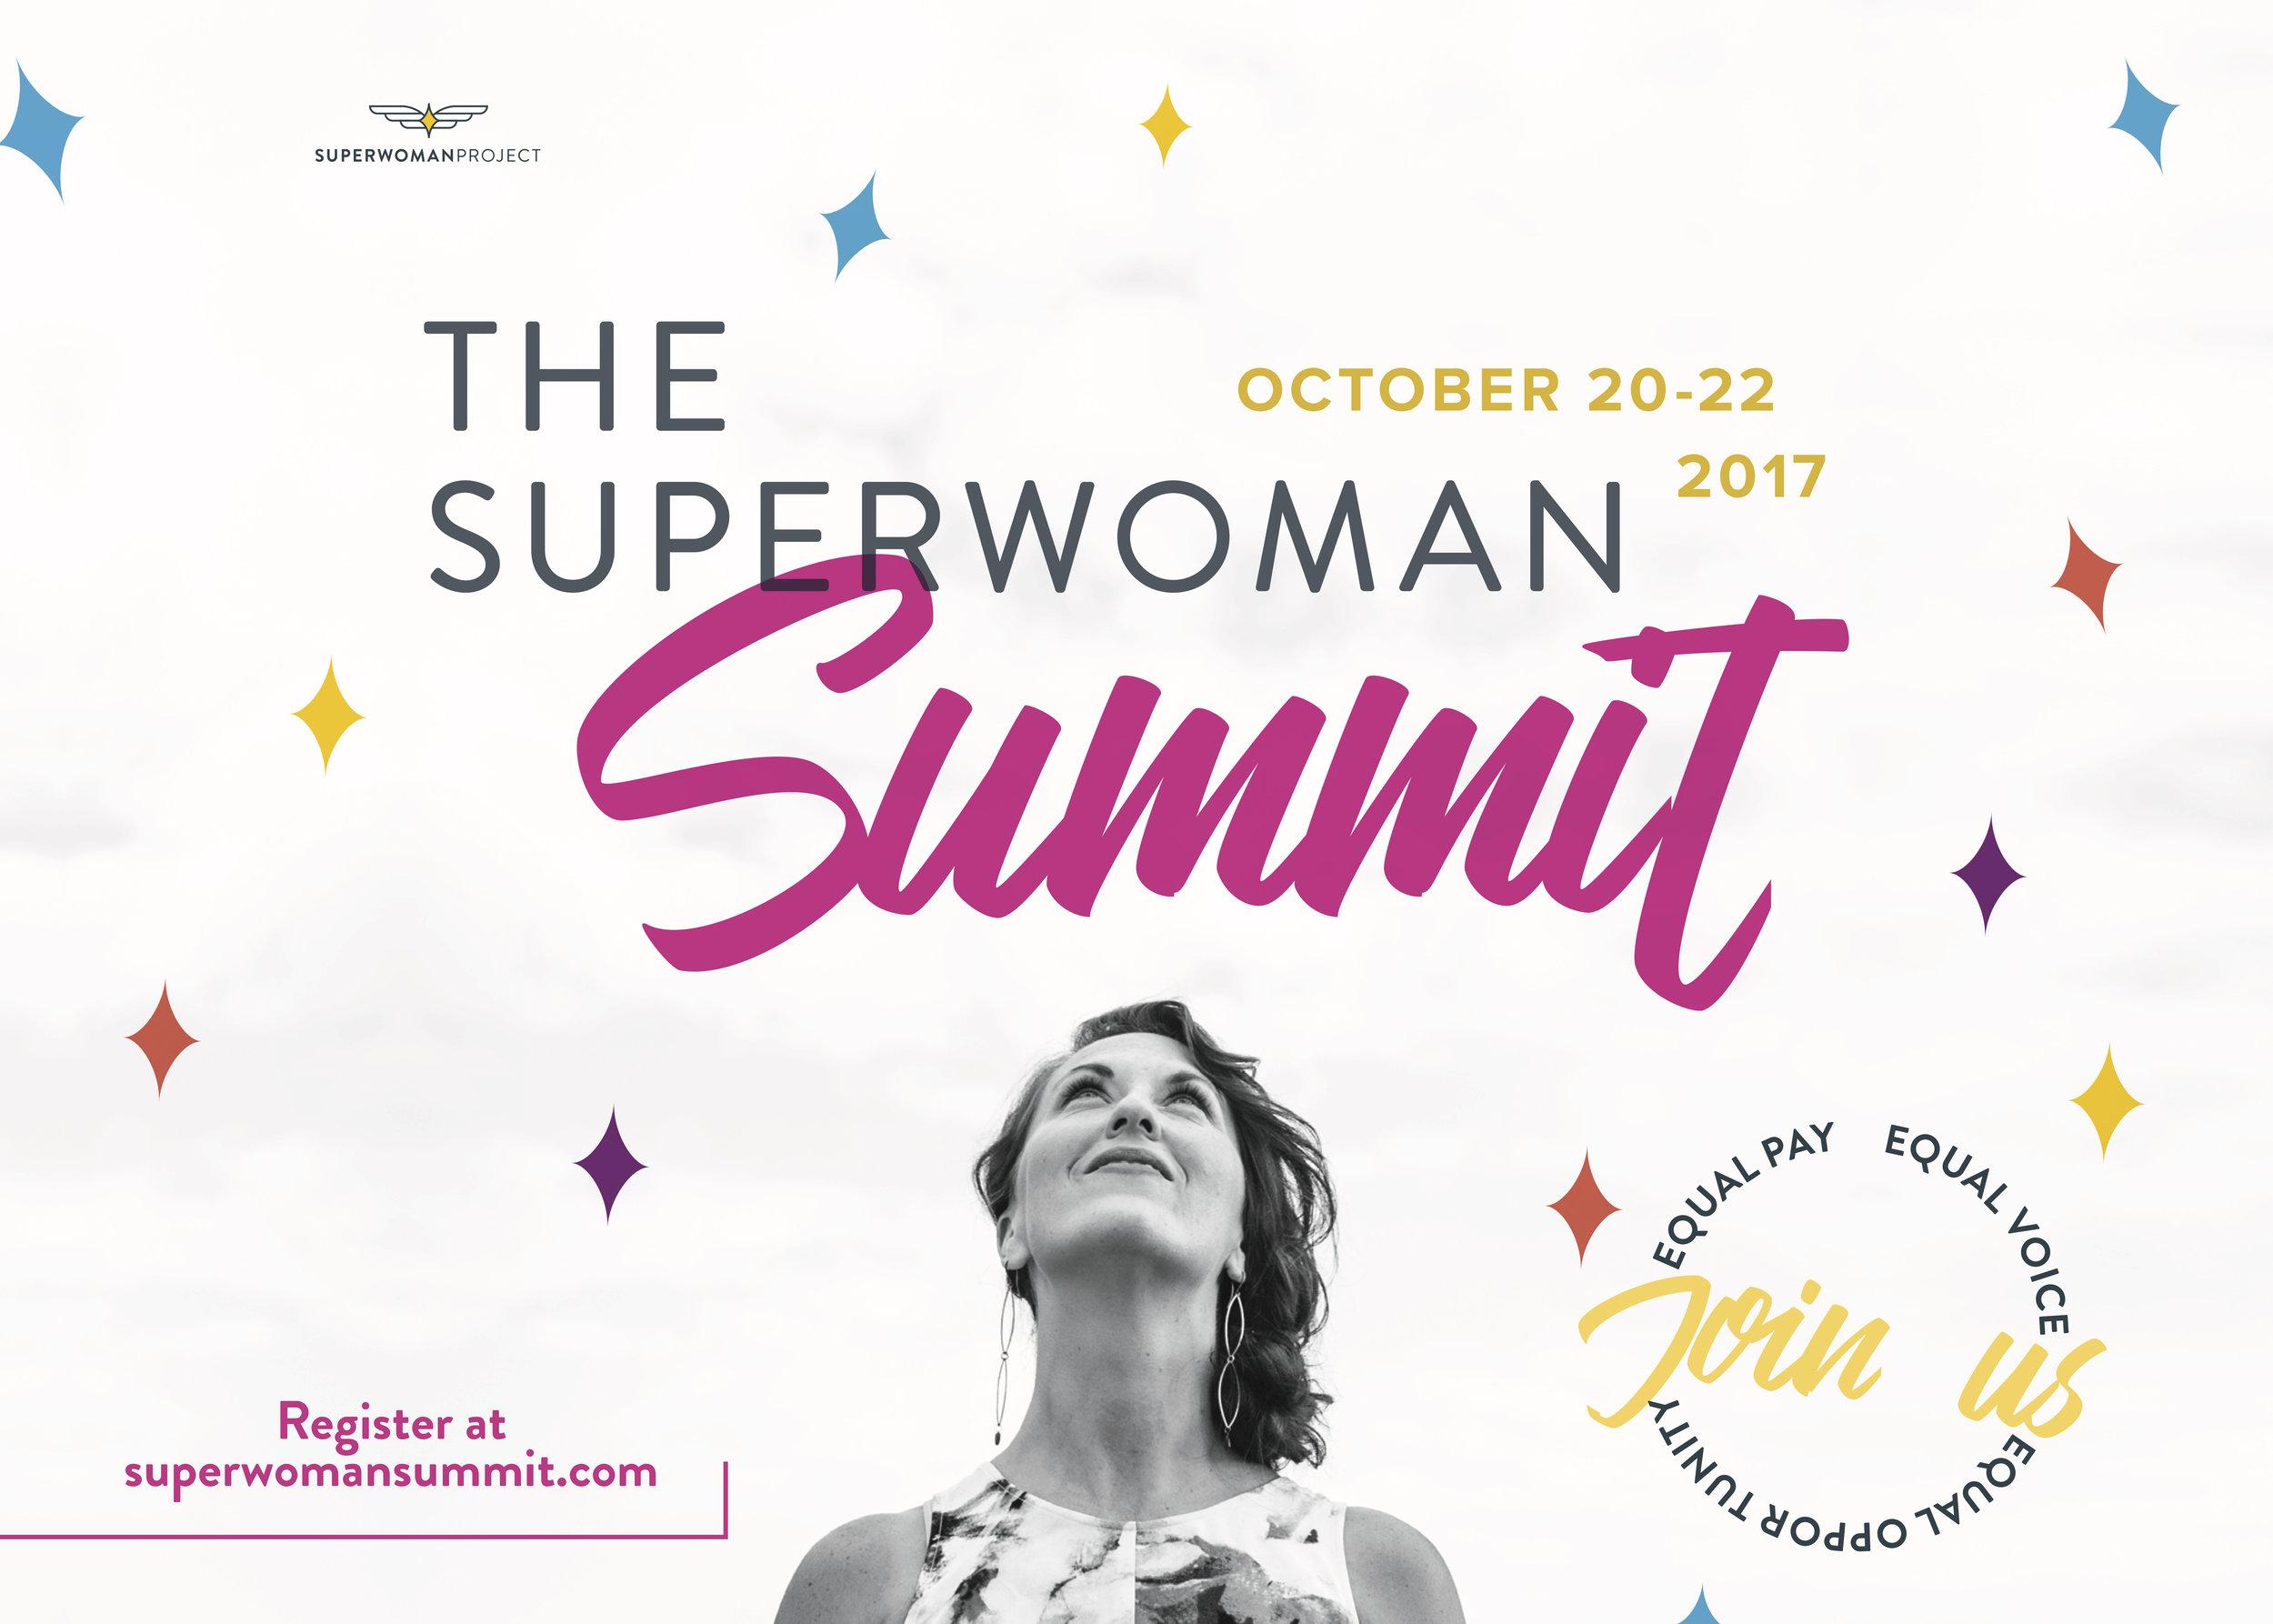 swp-summit-postcard-front.jpg